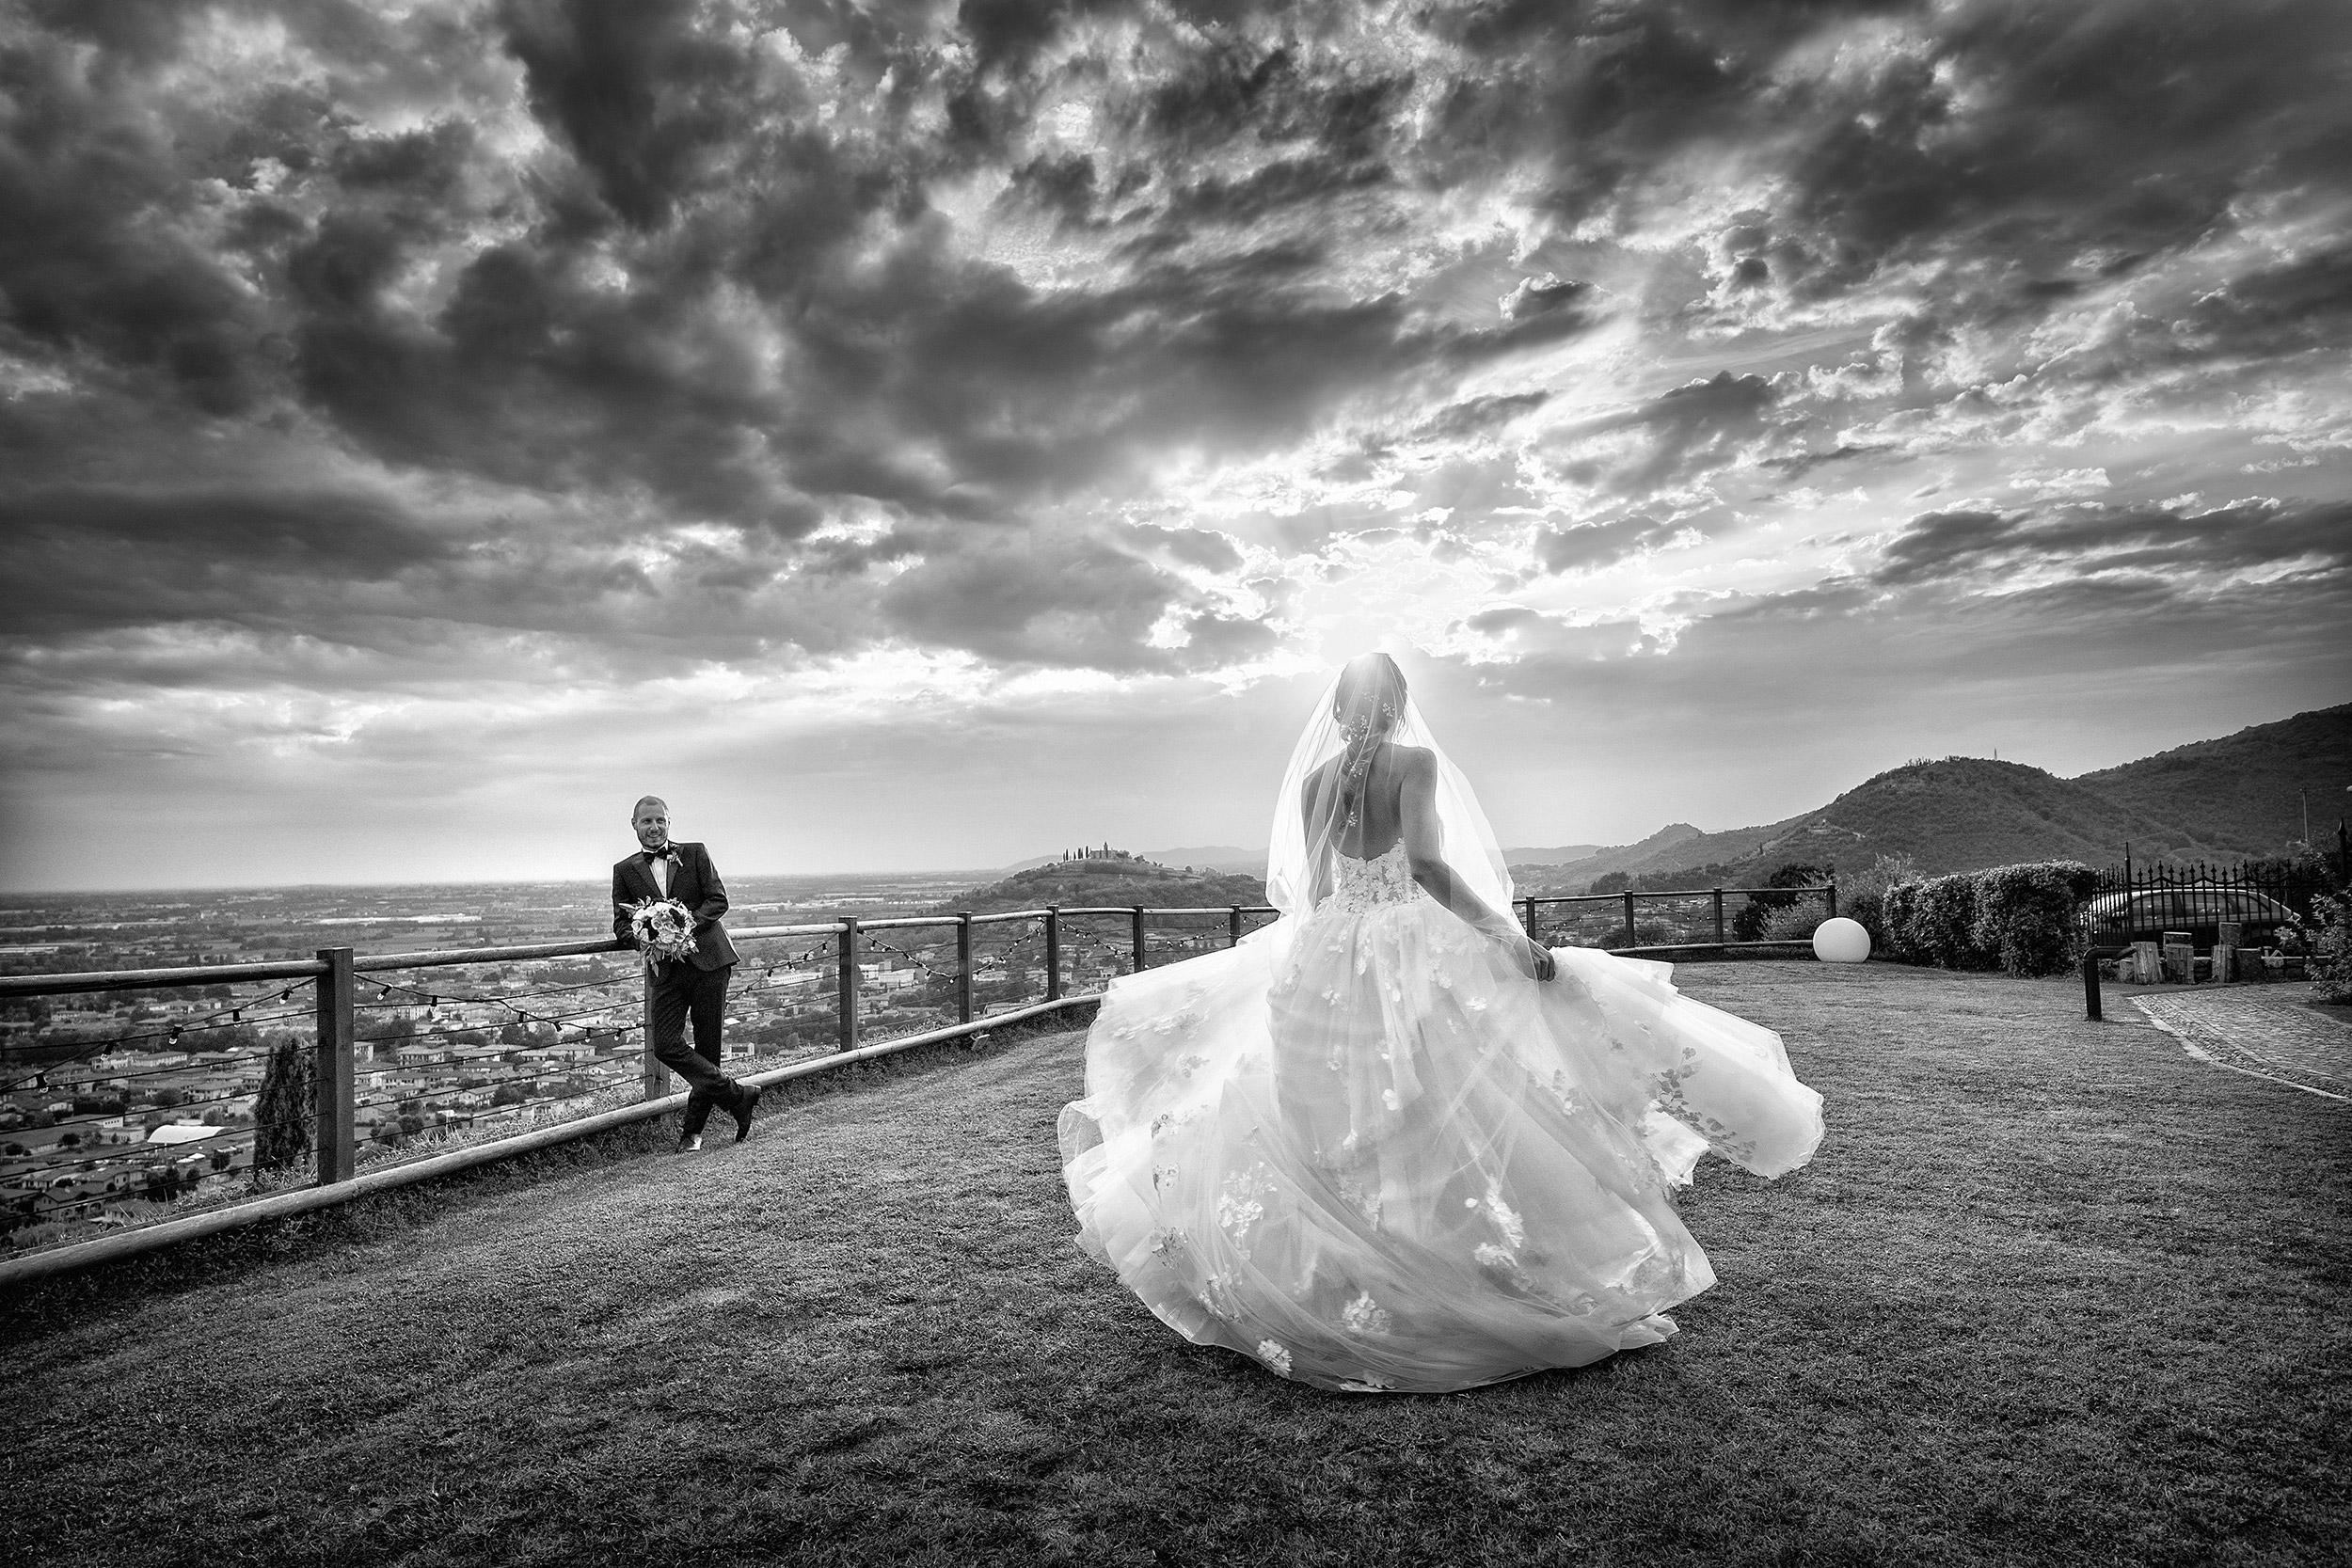 000 reportage wedding sposi foto matrimonio cantorie gussago brescia 1